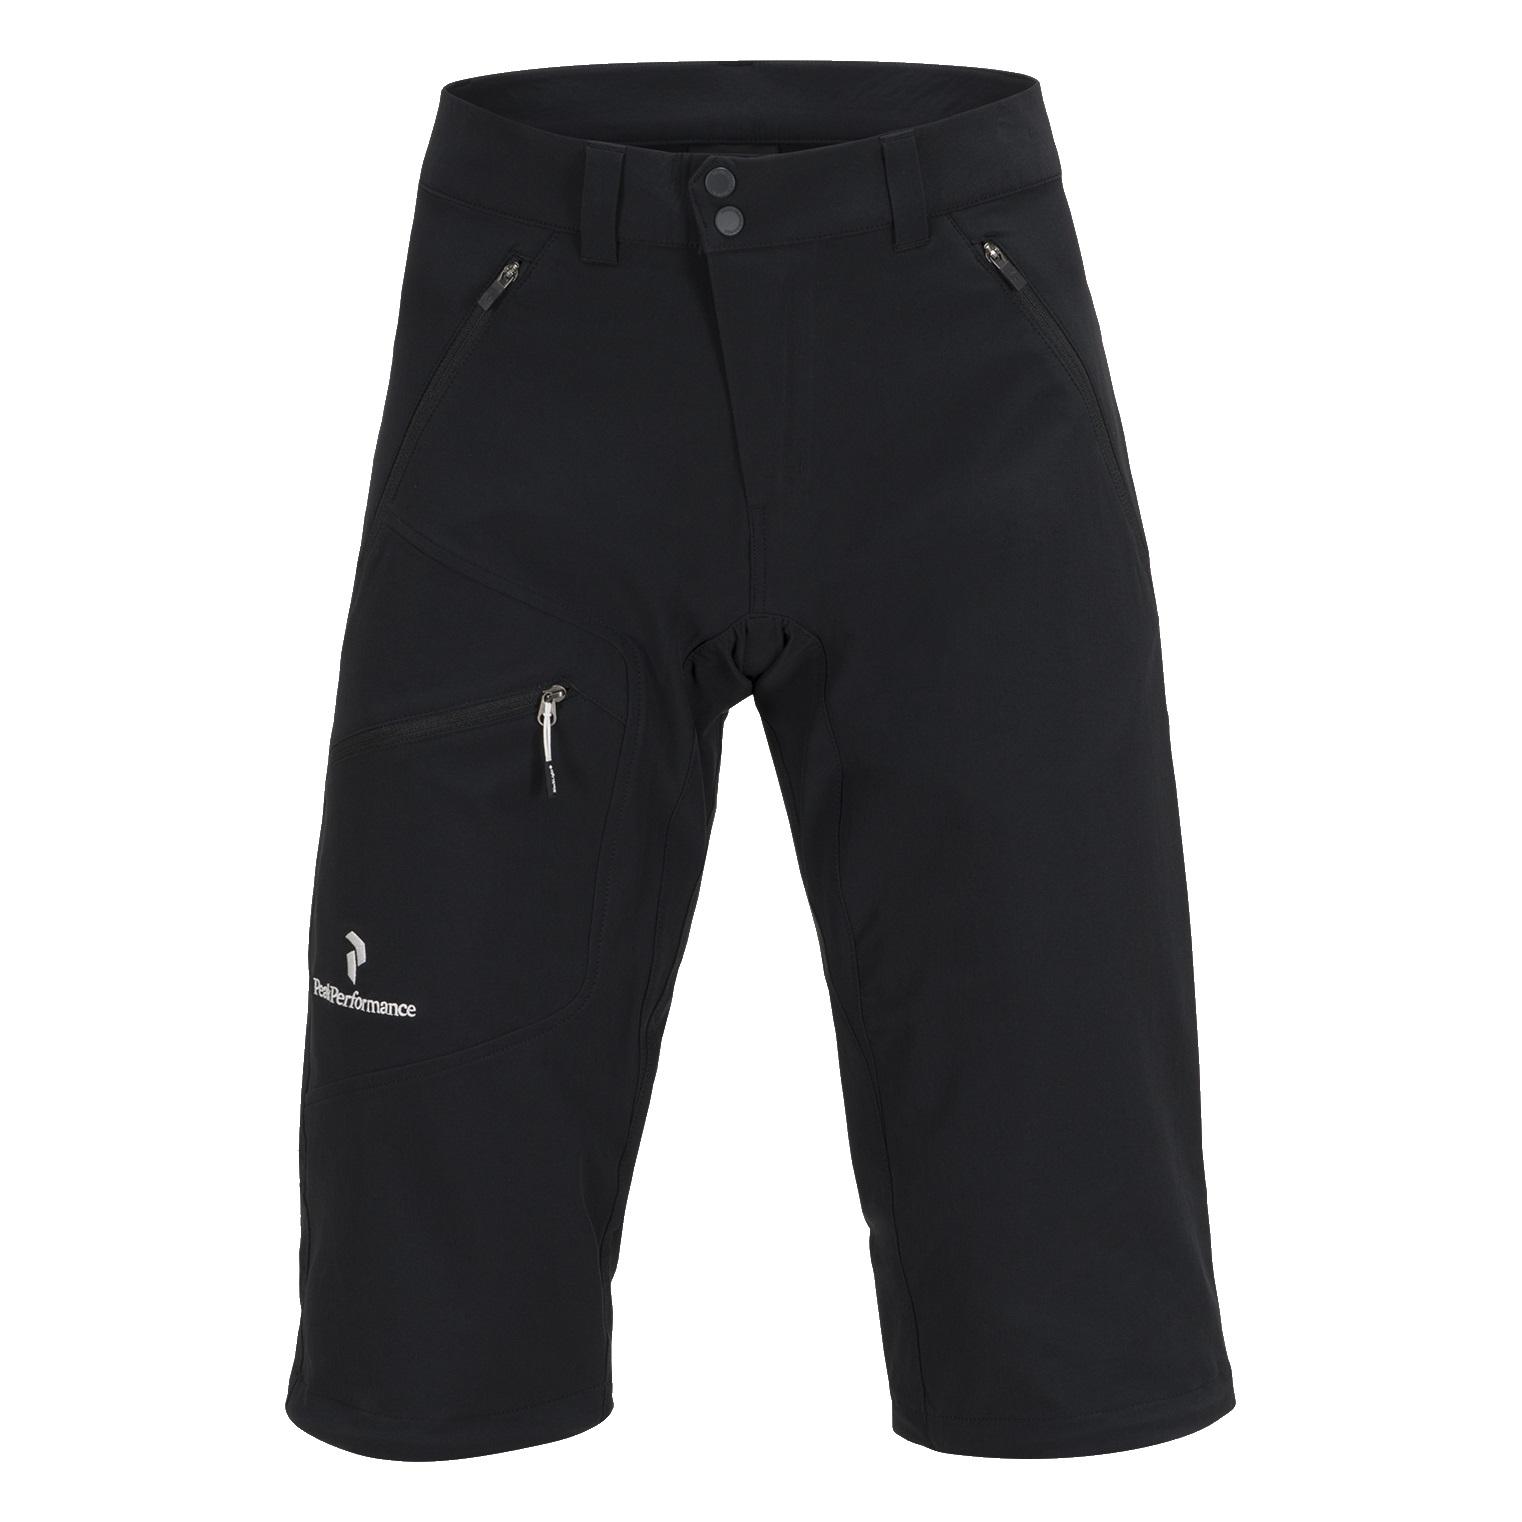 Vaude Badile shorts señora Softshell pantalones